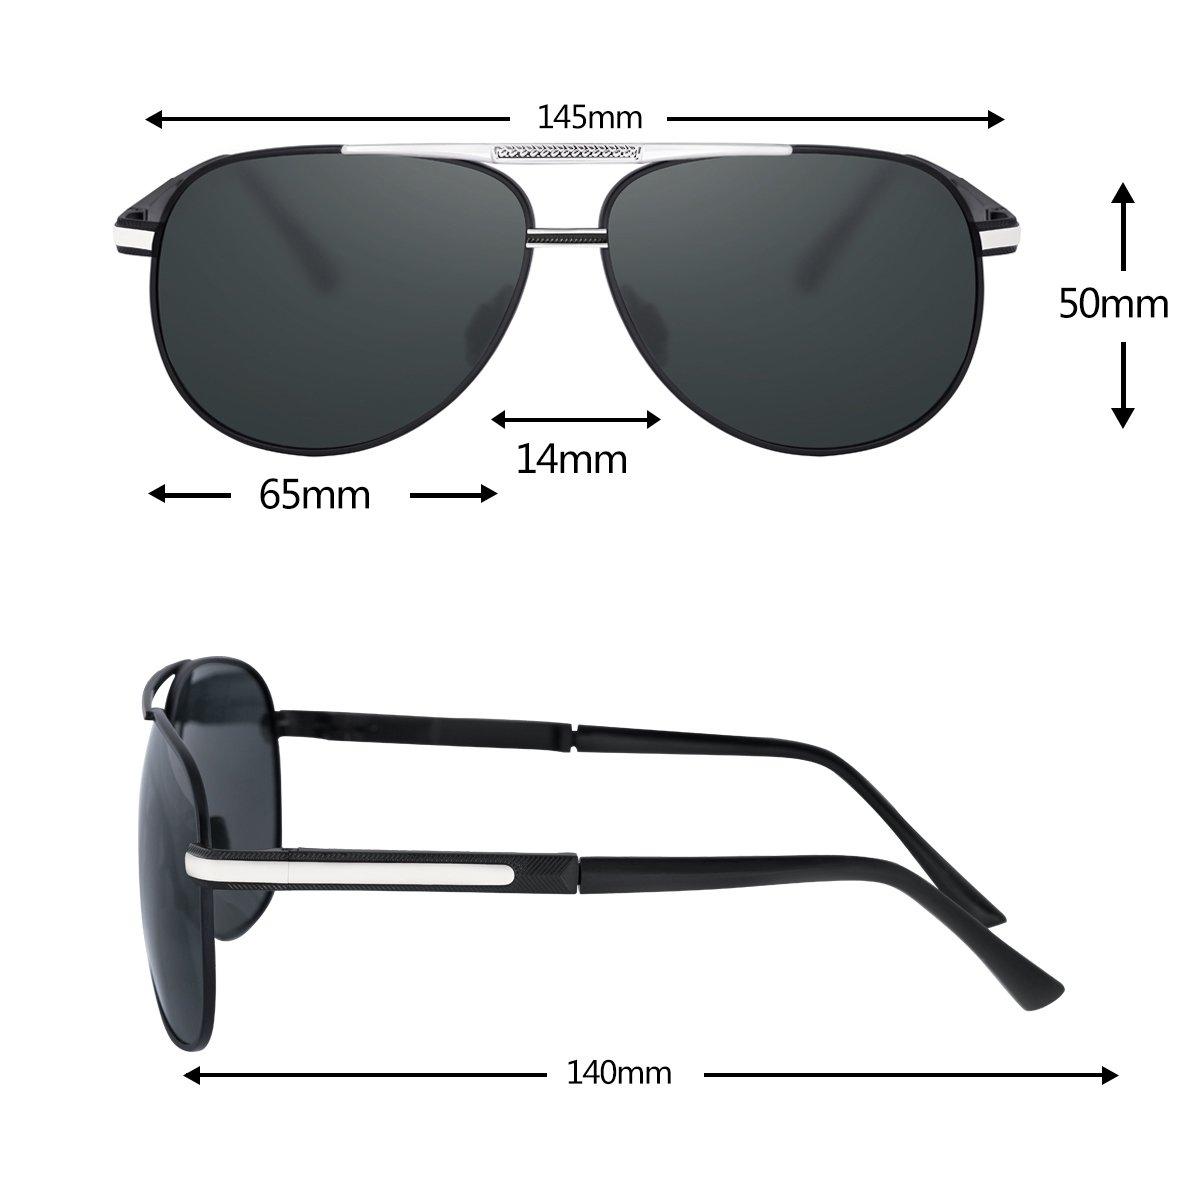 Zealme Polarized Fashion Aviator Anti Glare Pilot Driving Fashion Lightweight Durable Unbreakable Frame Cycling Fishing cycle Hiking Dark Sunglasses for Men Women (black) BM110